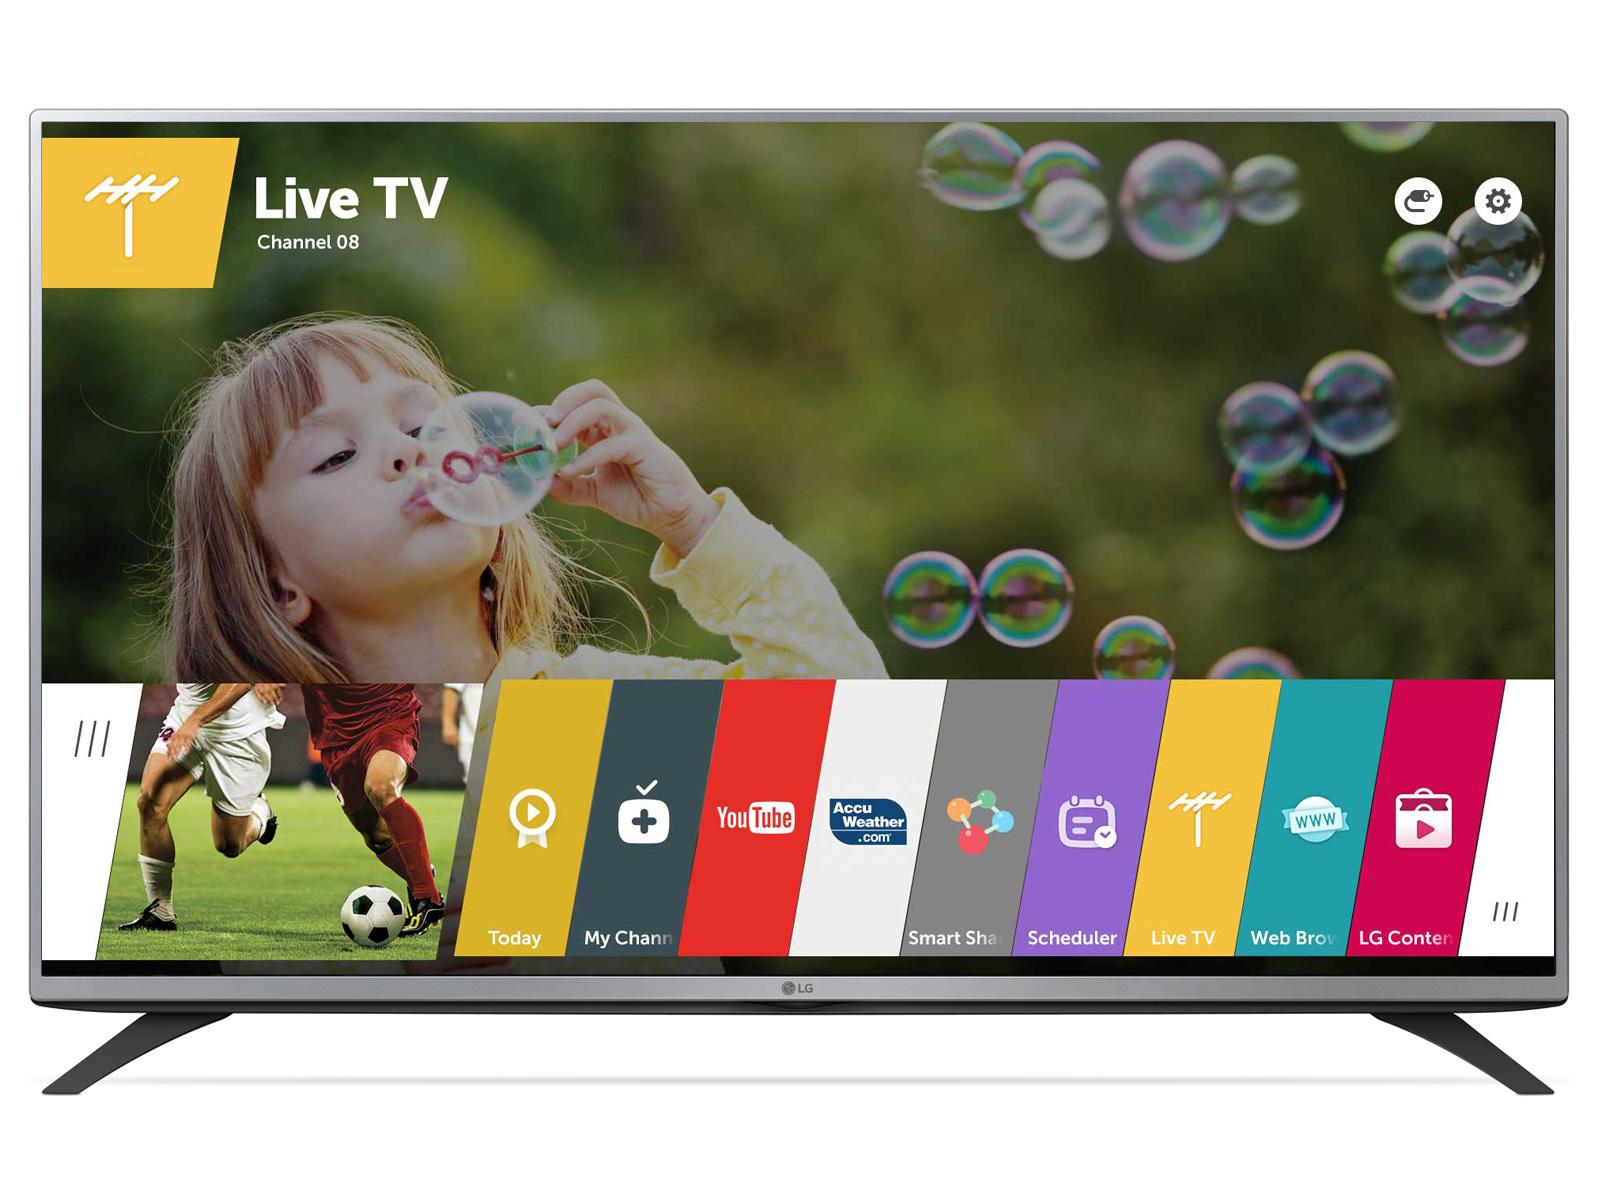 ★杰米家電☆ LG樂金 43LF5900 43吋 連網 LED 液晶電視